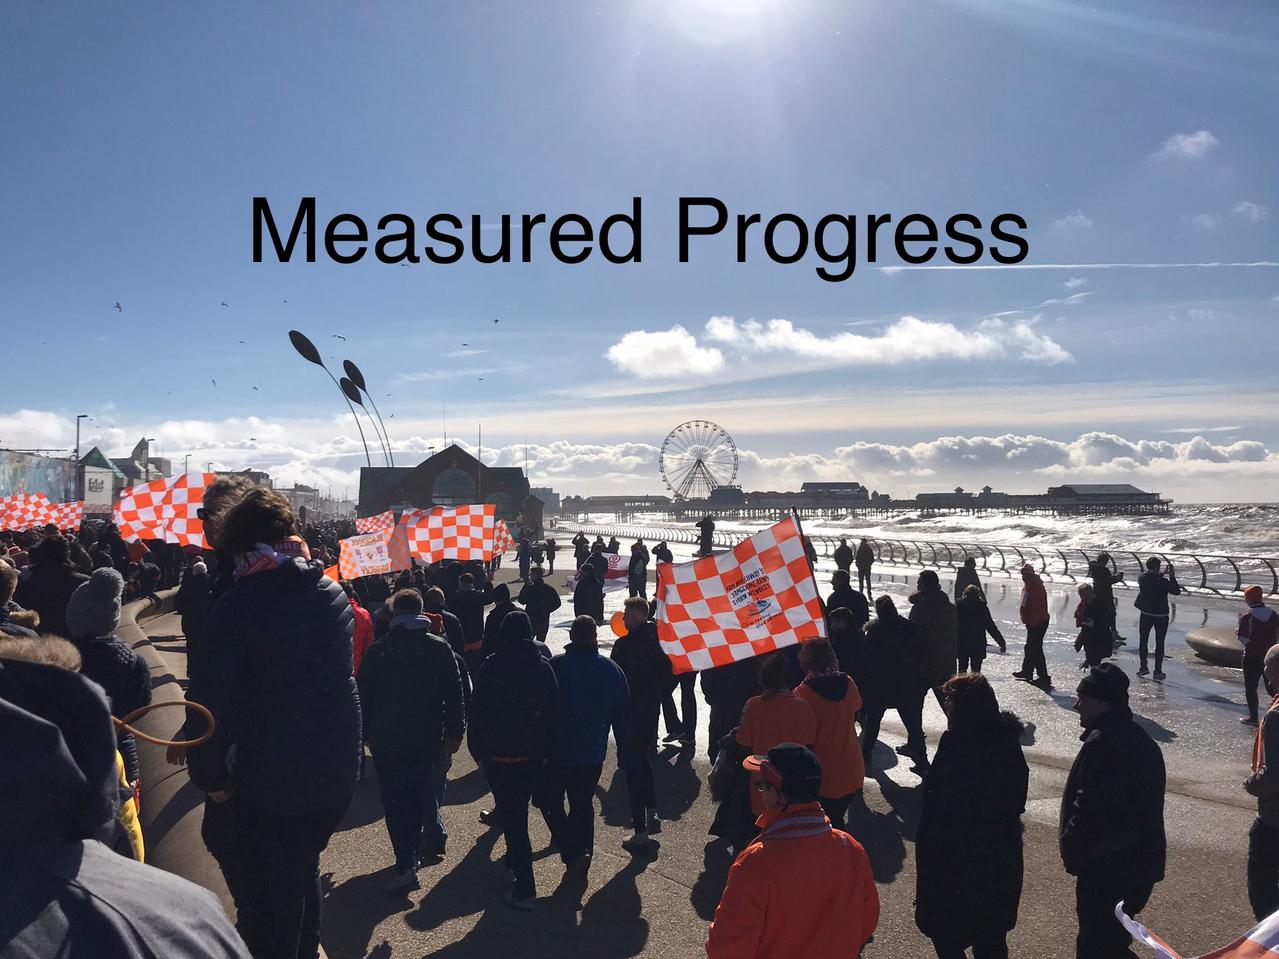 Measured Progress